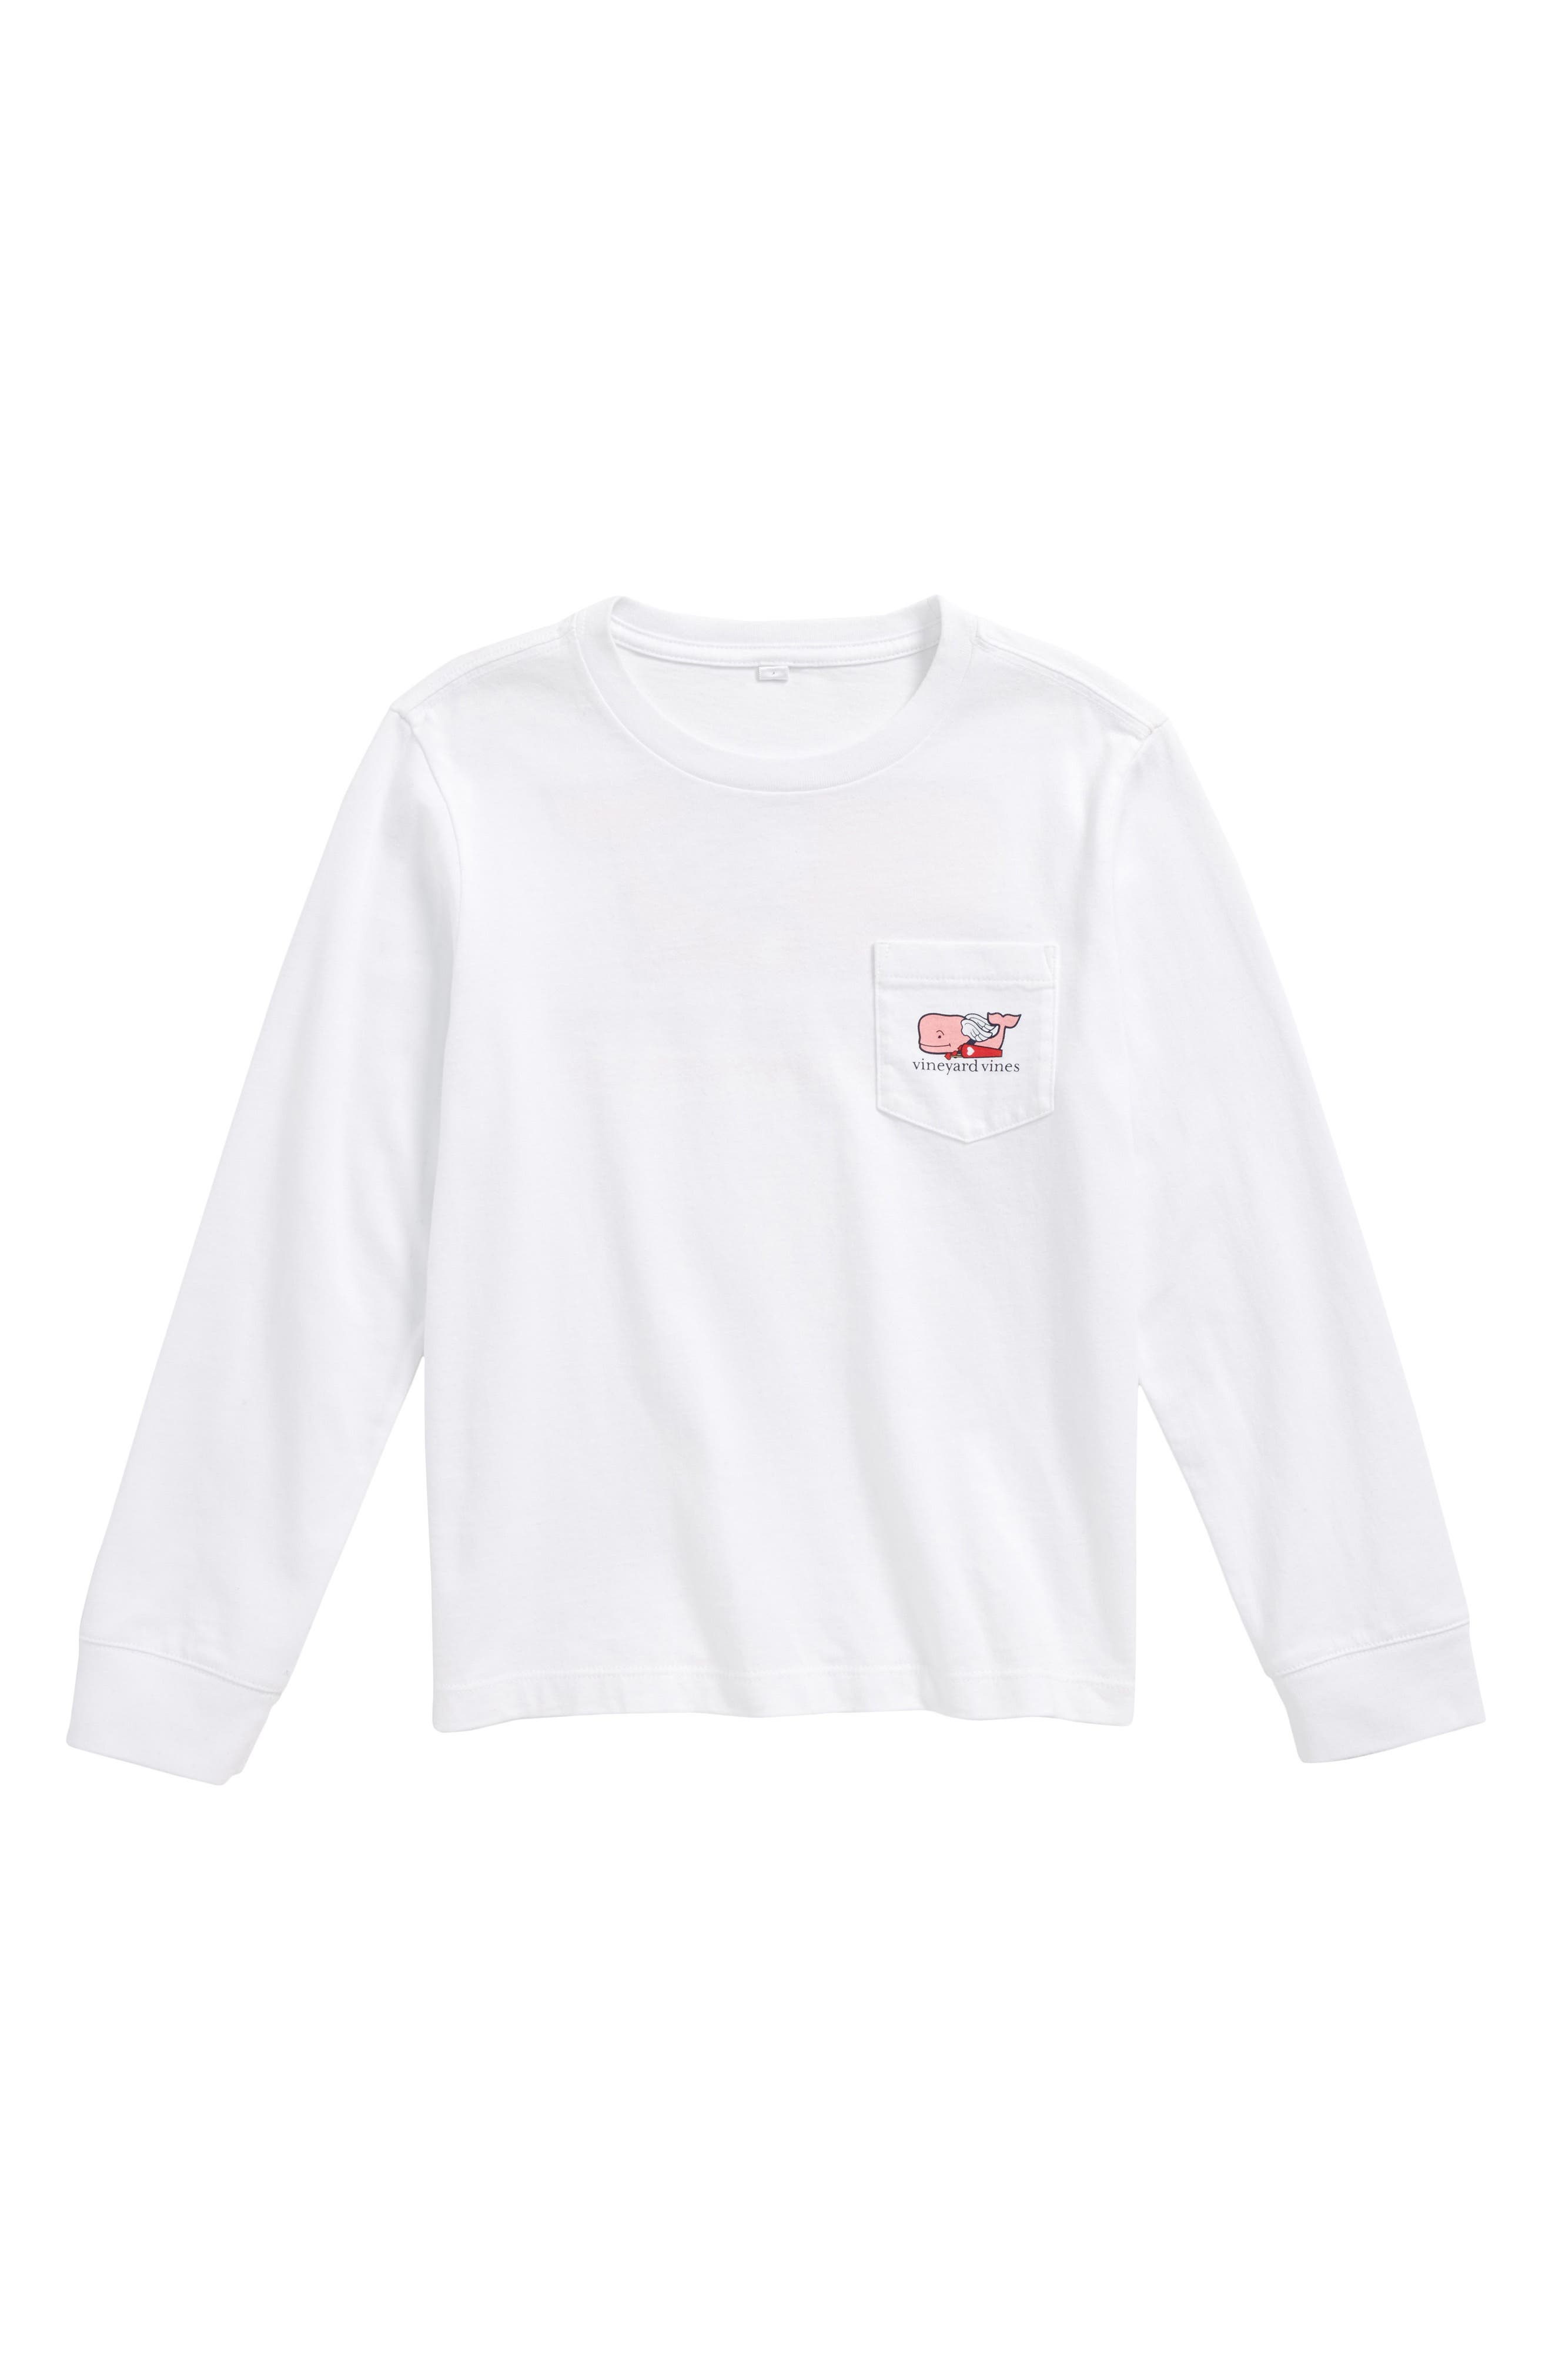 Main Image - vineyard vines Cupid Whale Pocket T-Shirt (Toddler Boys & Little Boys)